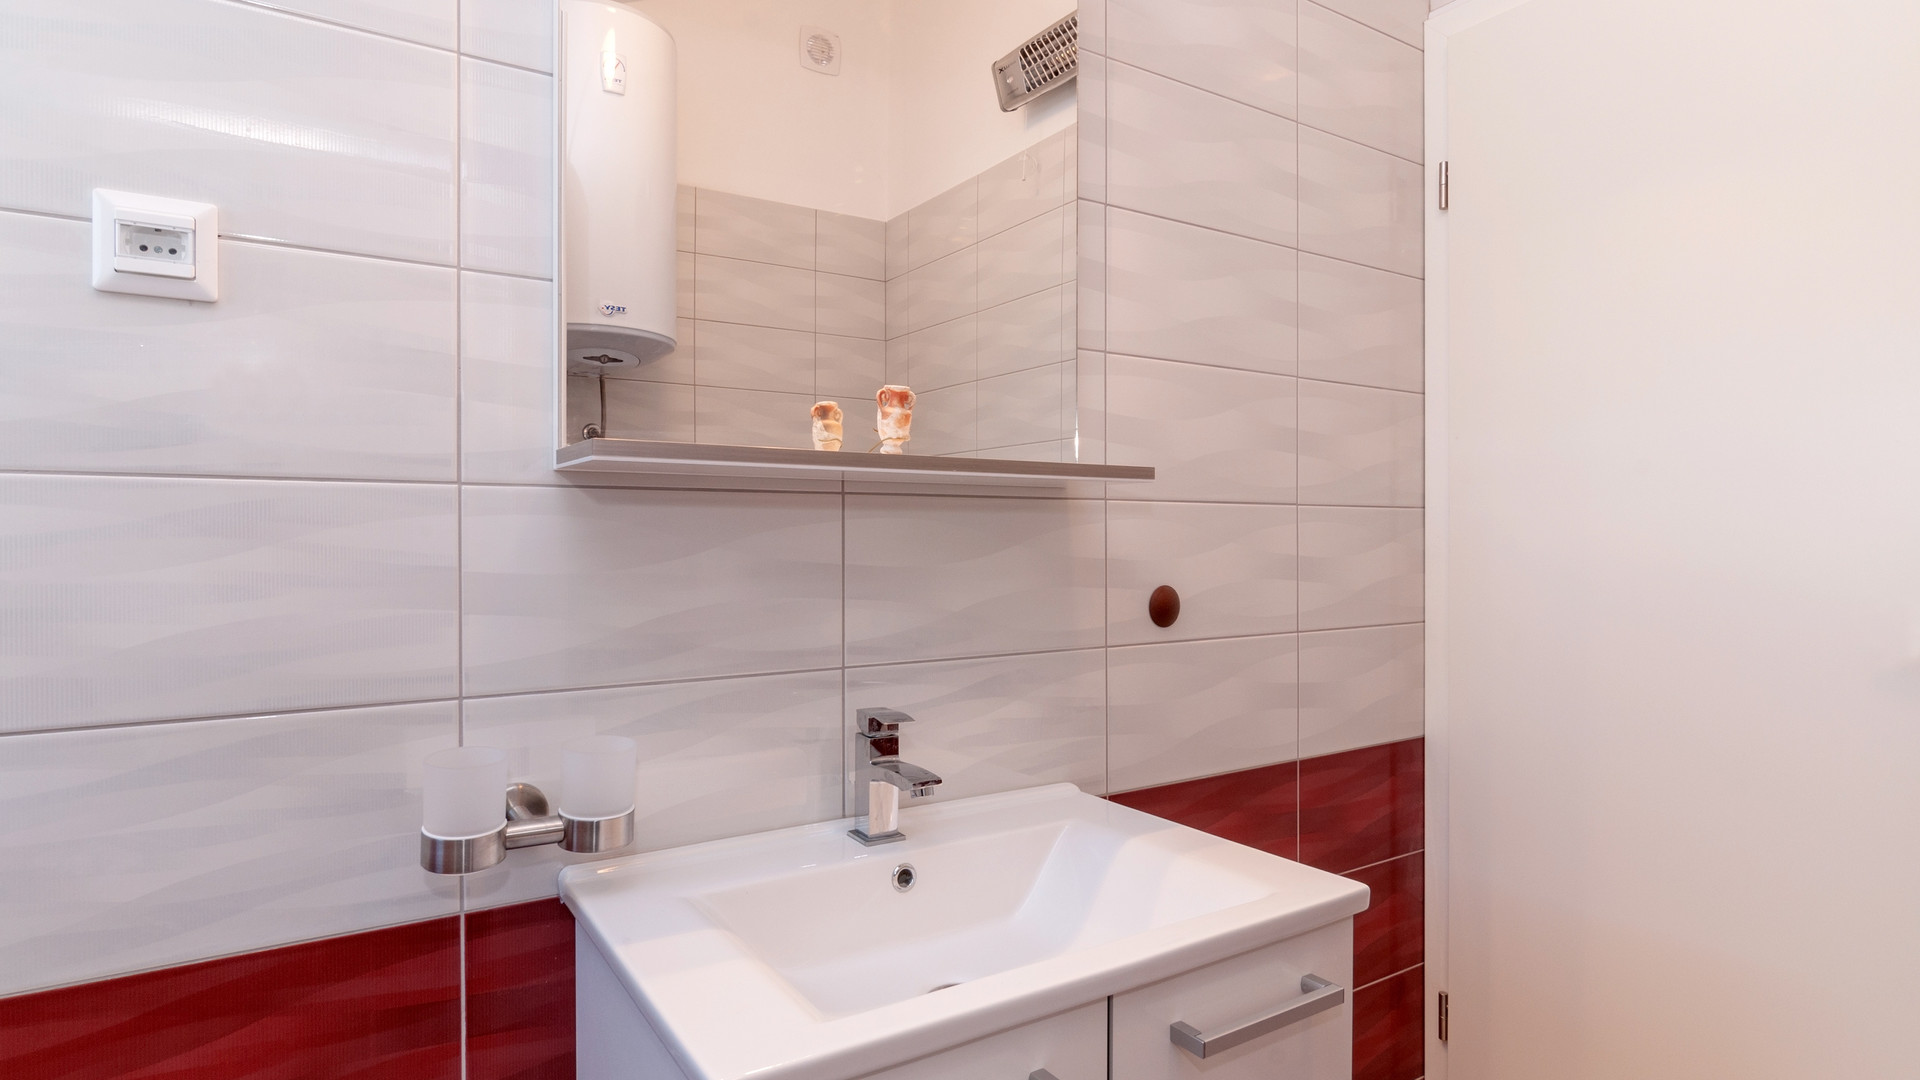 kupaona 1 smokva.jpg